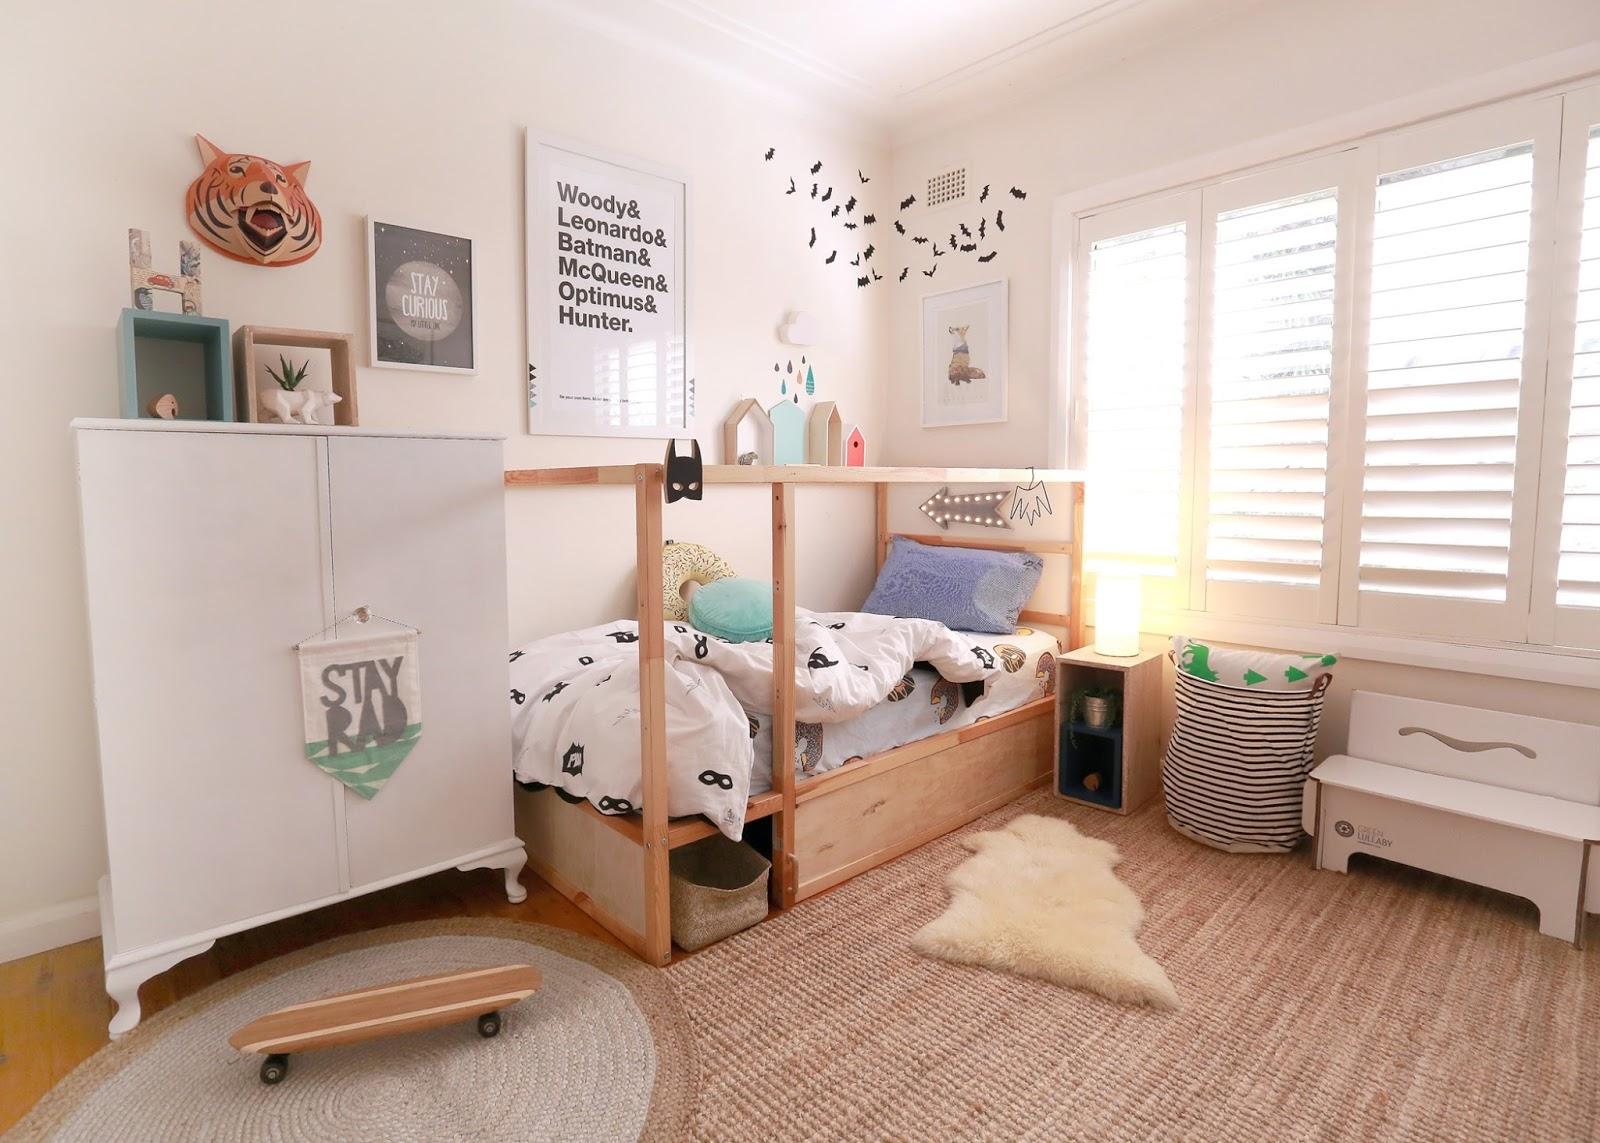 Full Size of Kura Hack Storage Ikea House Bed Ideas Bunk Instructions Floor The Boo And Boy Tubu Kids Wohnzimmer Kura Hack